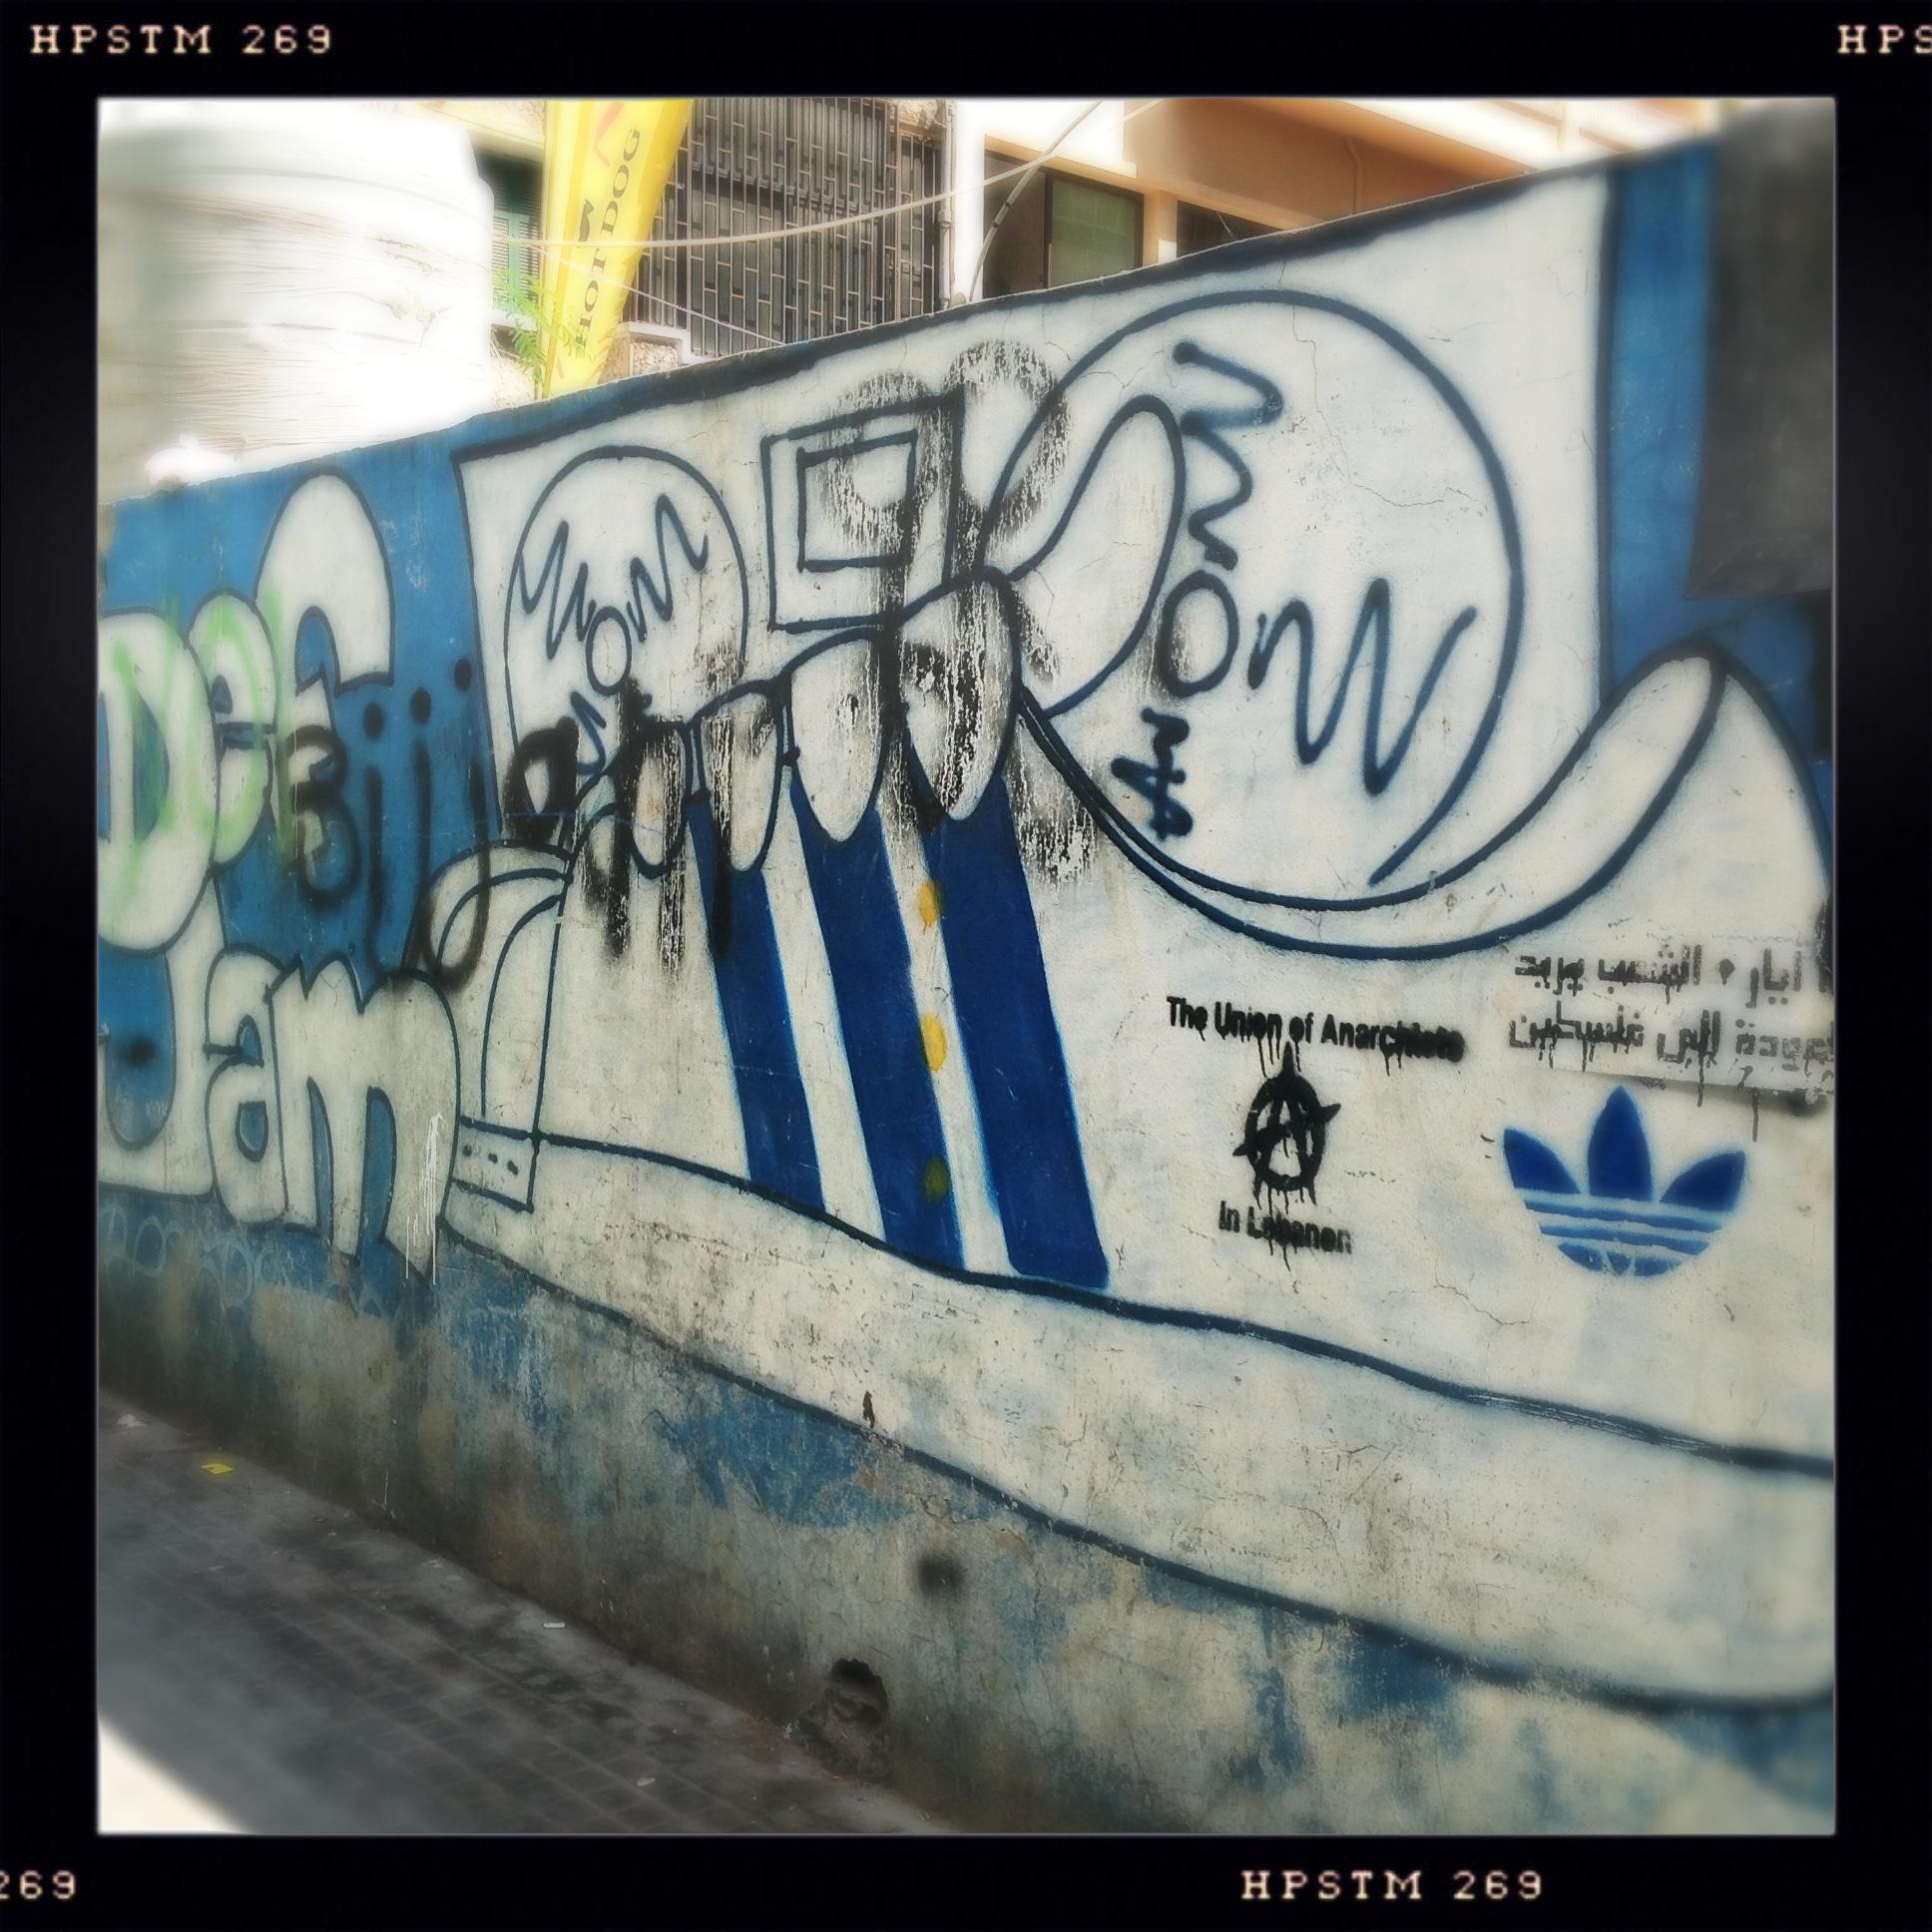 Beirut Tokidokinomad Tokidokinomad – GraffitiAdidas GraffitiAdidas GraffitiAdidas Beirut – Beirut qL35AR4j